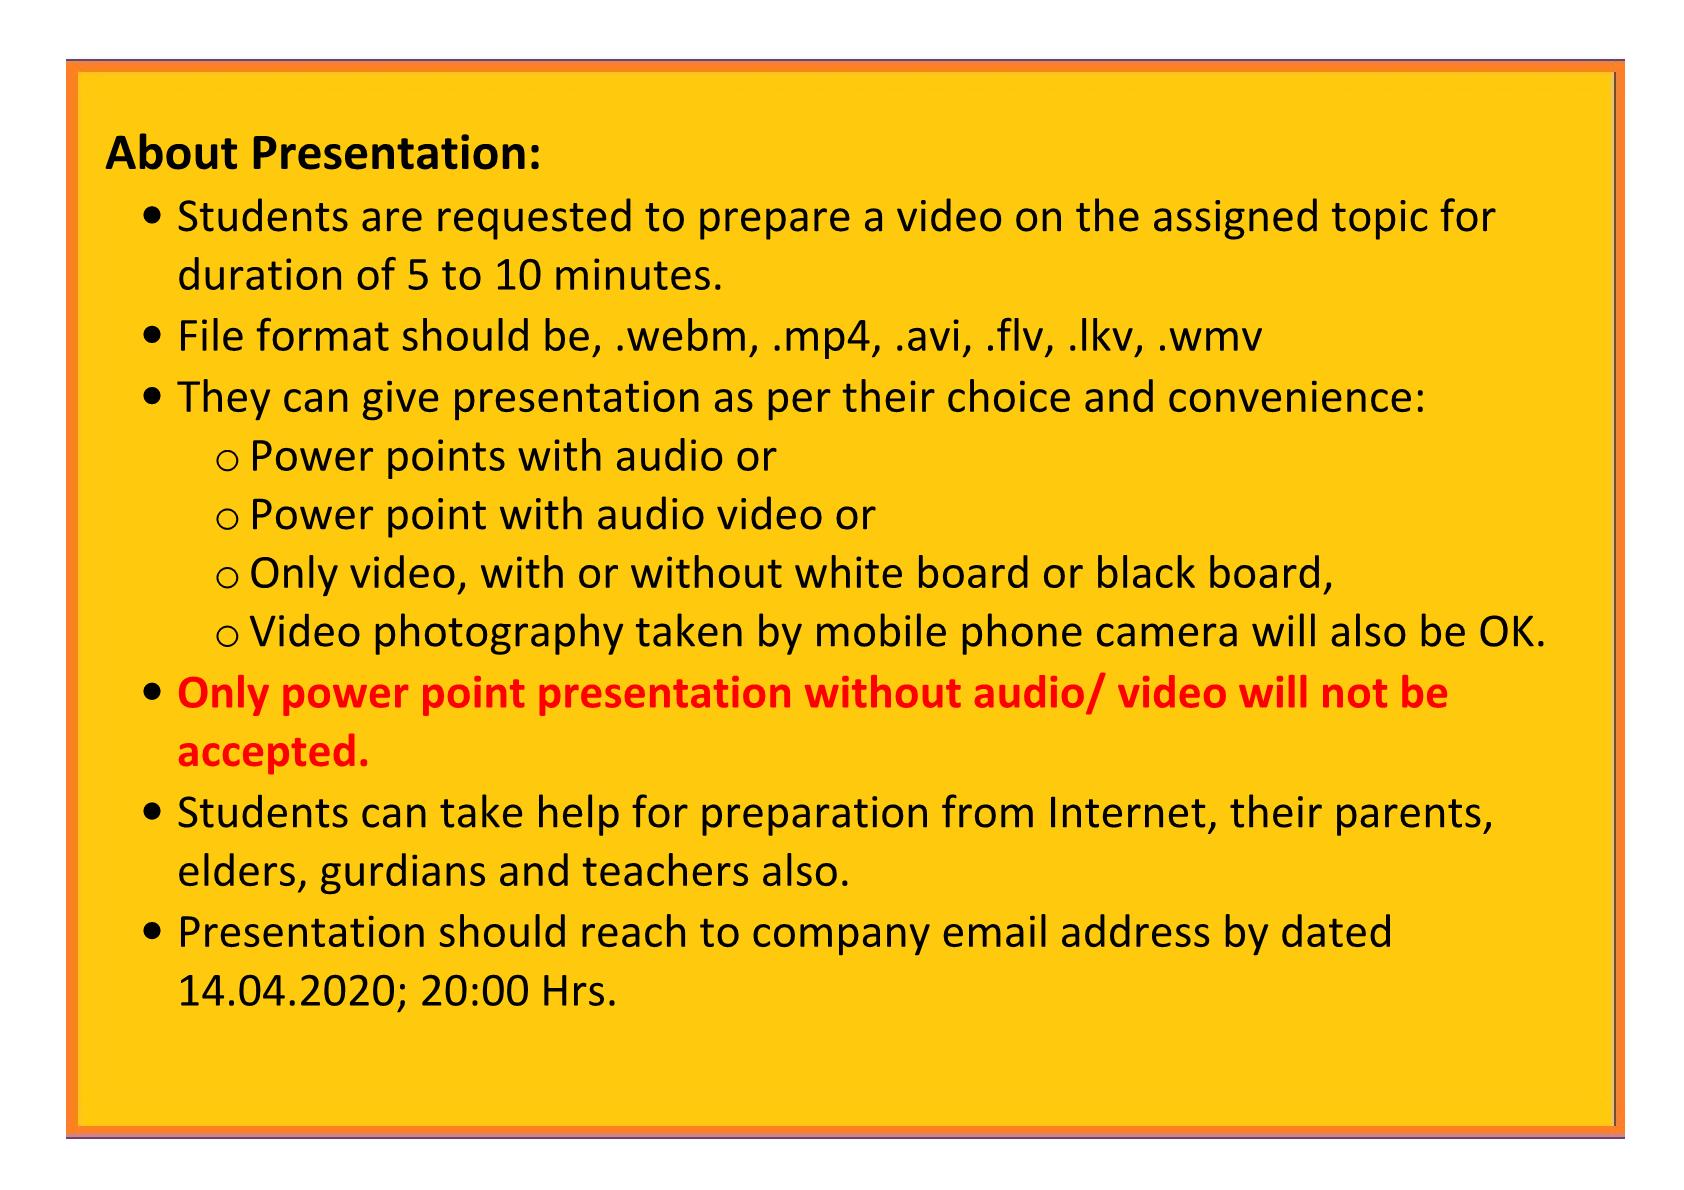 About Presentation